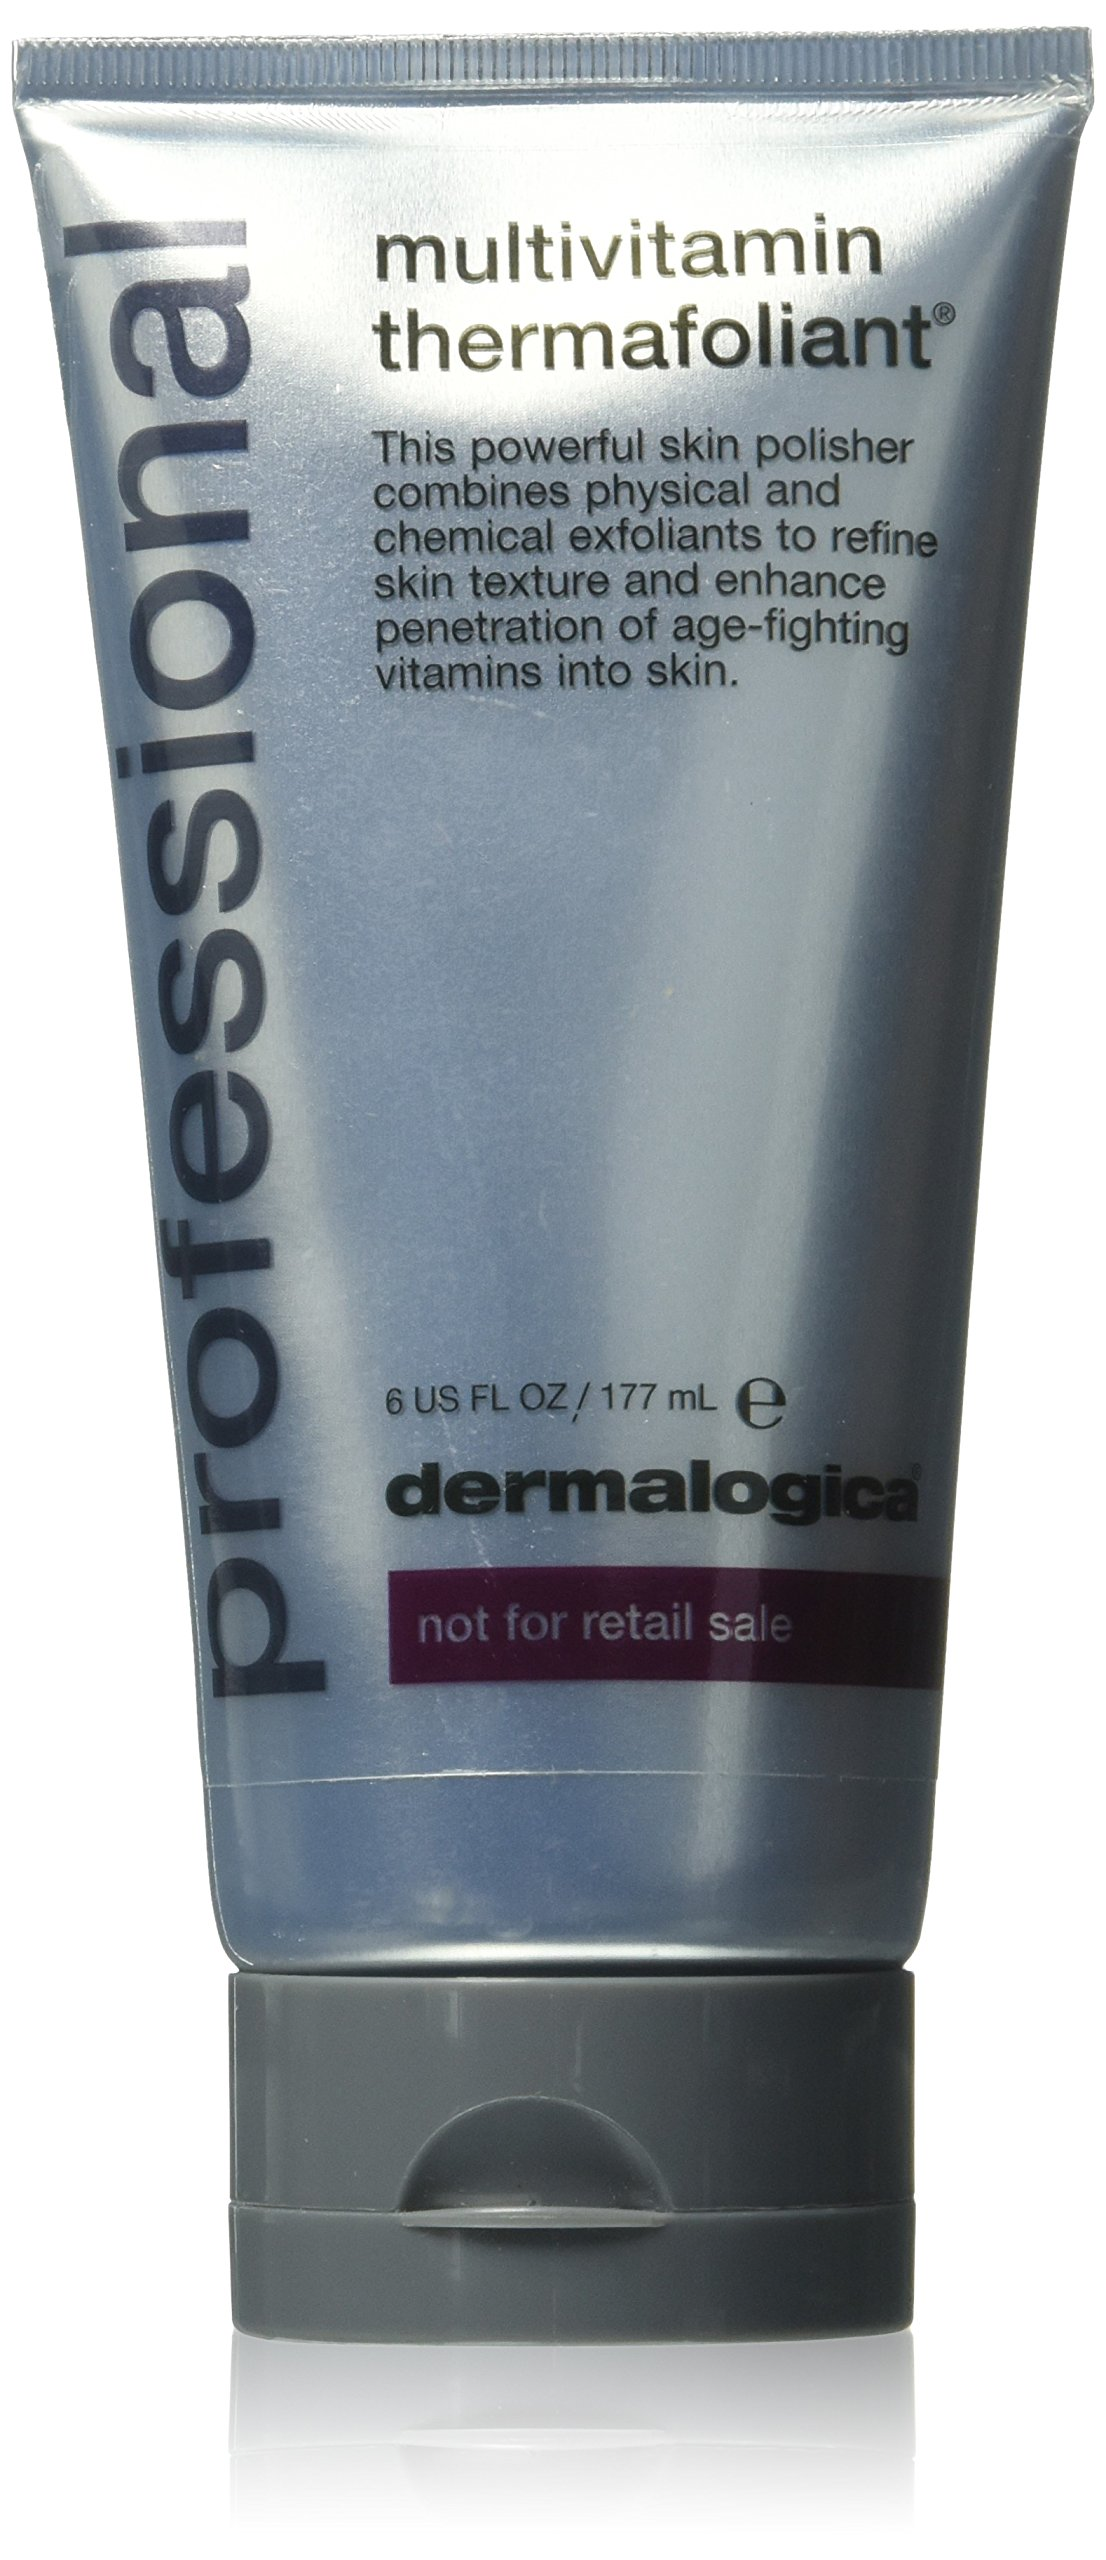 Dermalogica Multivitamin Thermofoliant, 6.0 Fluid Ounce